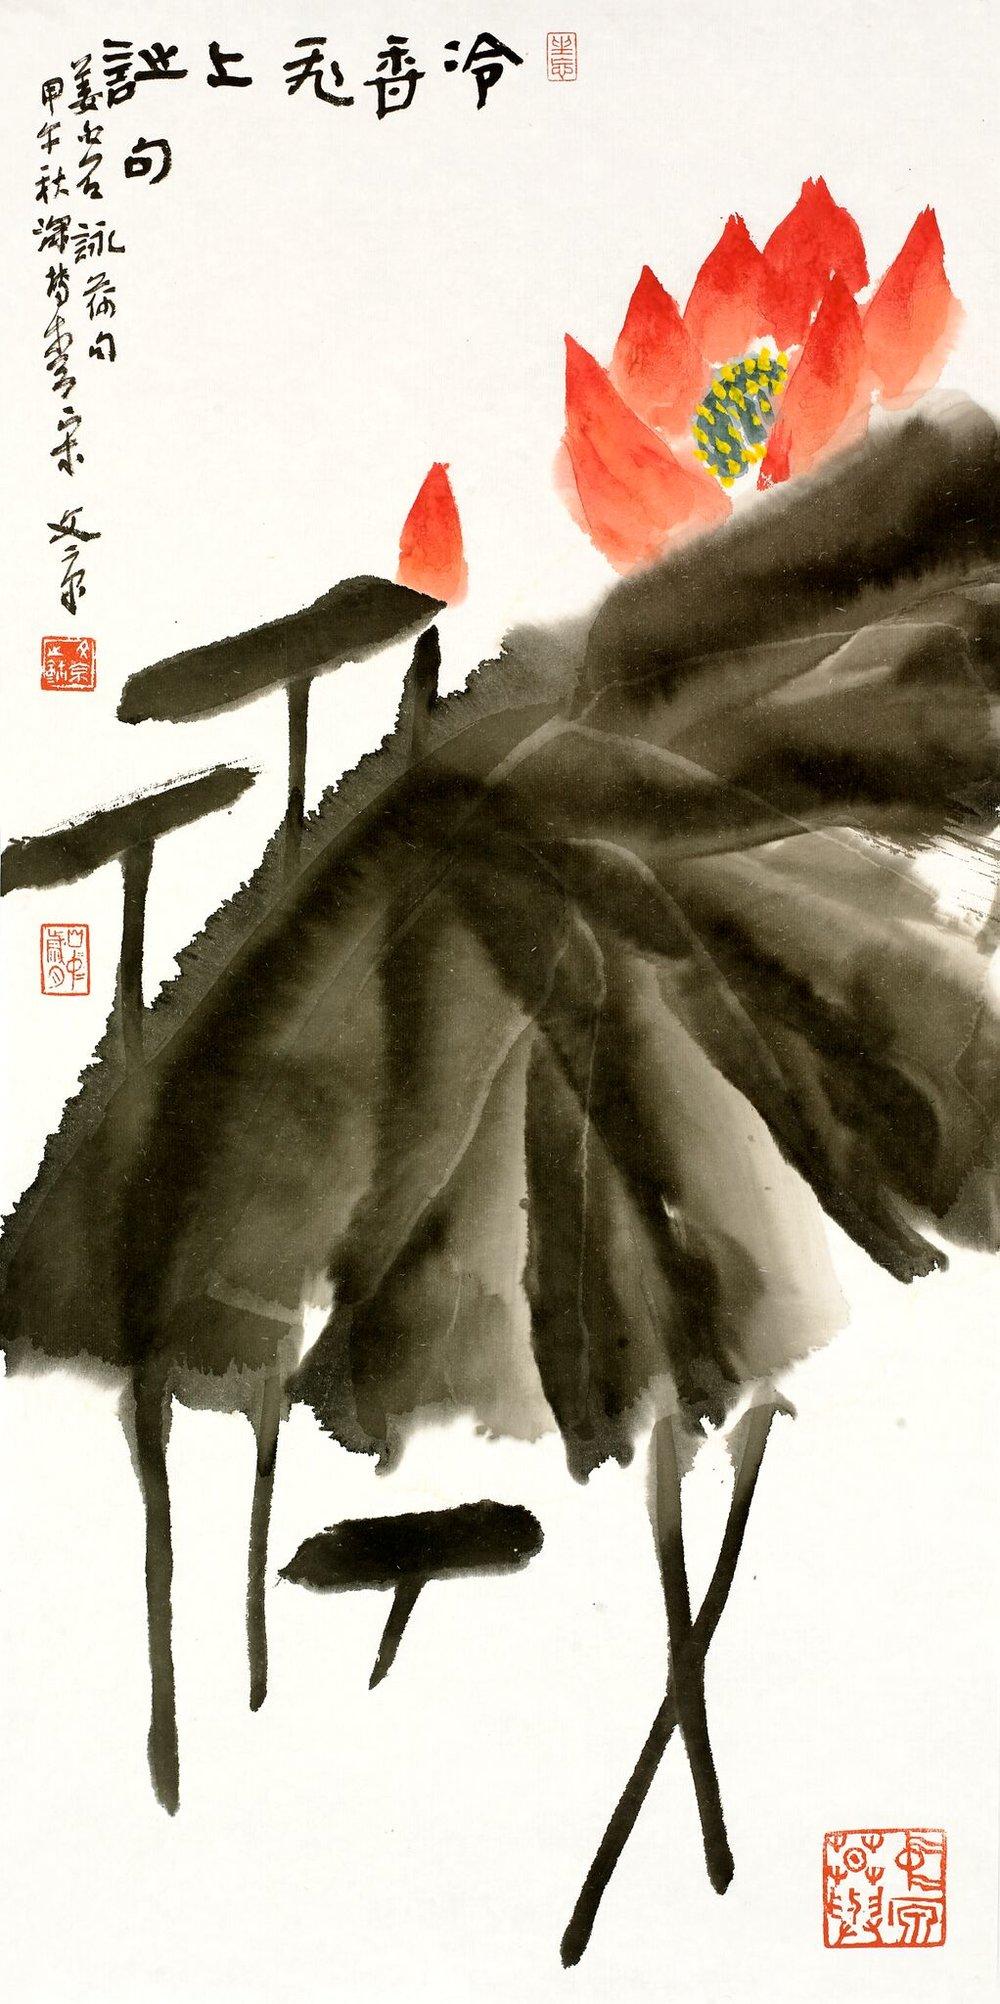 5 Song Wenjing Art.jpg